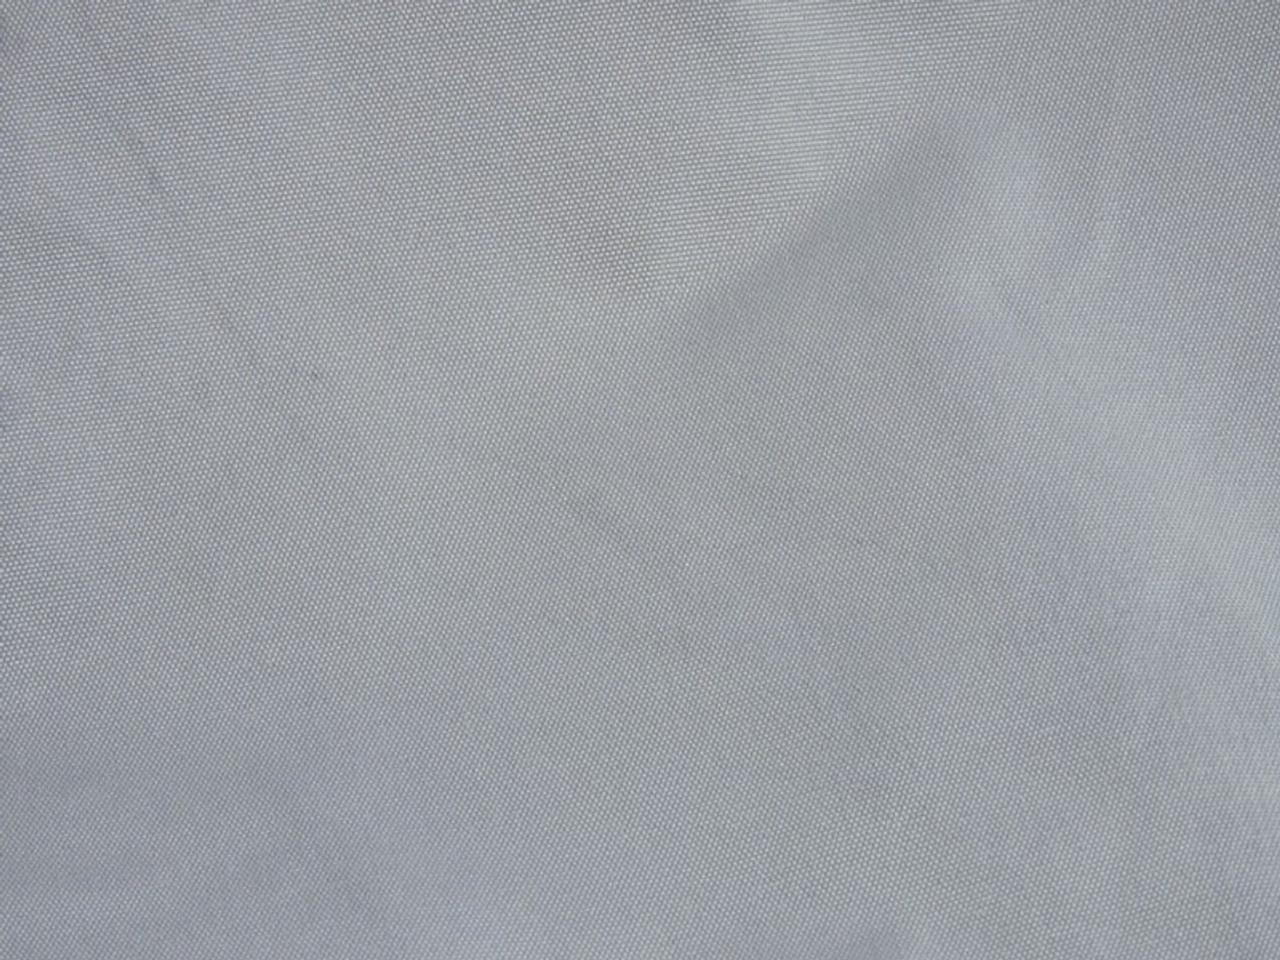 Venture all season storage cover premium marine grade fabric